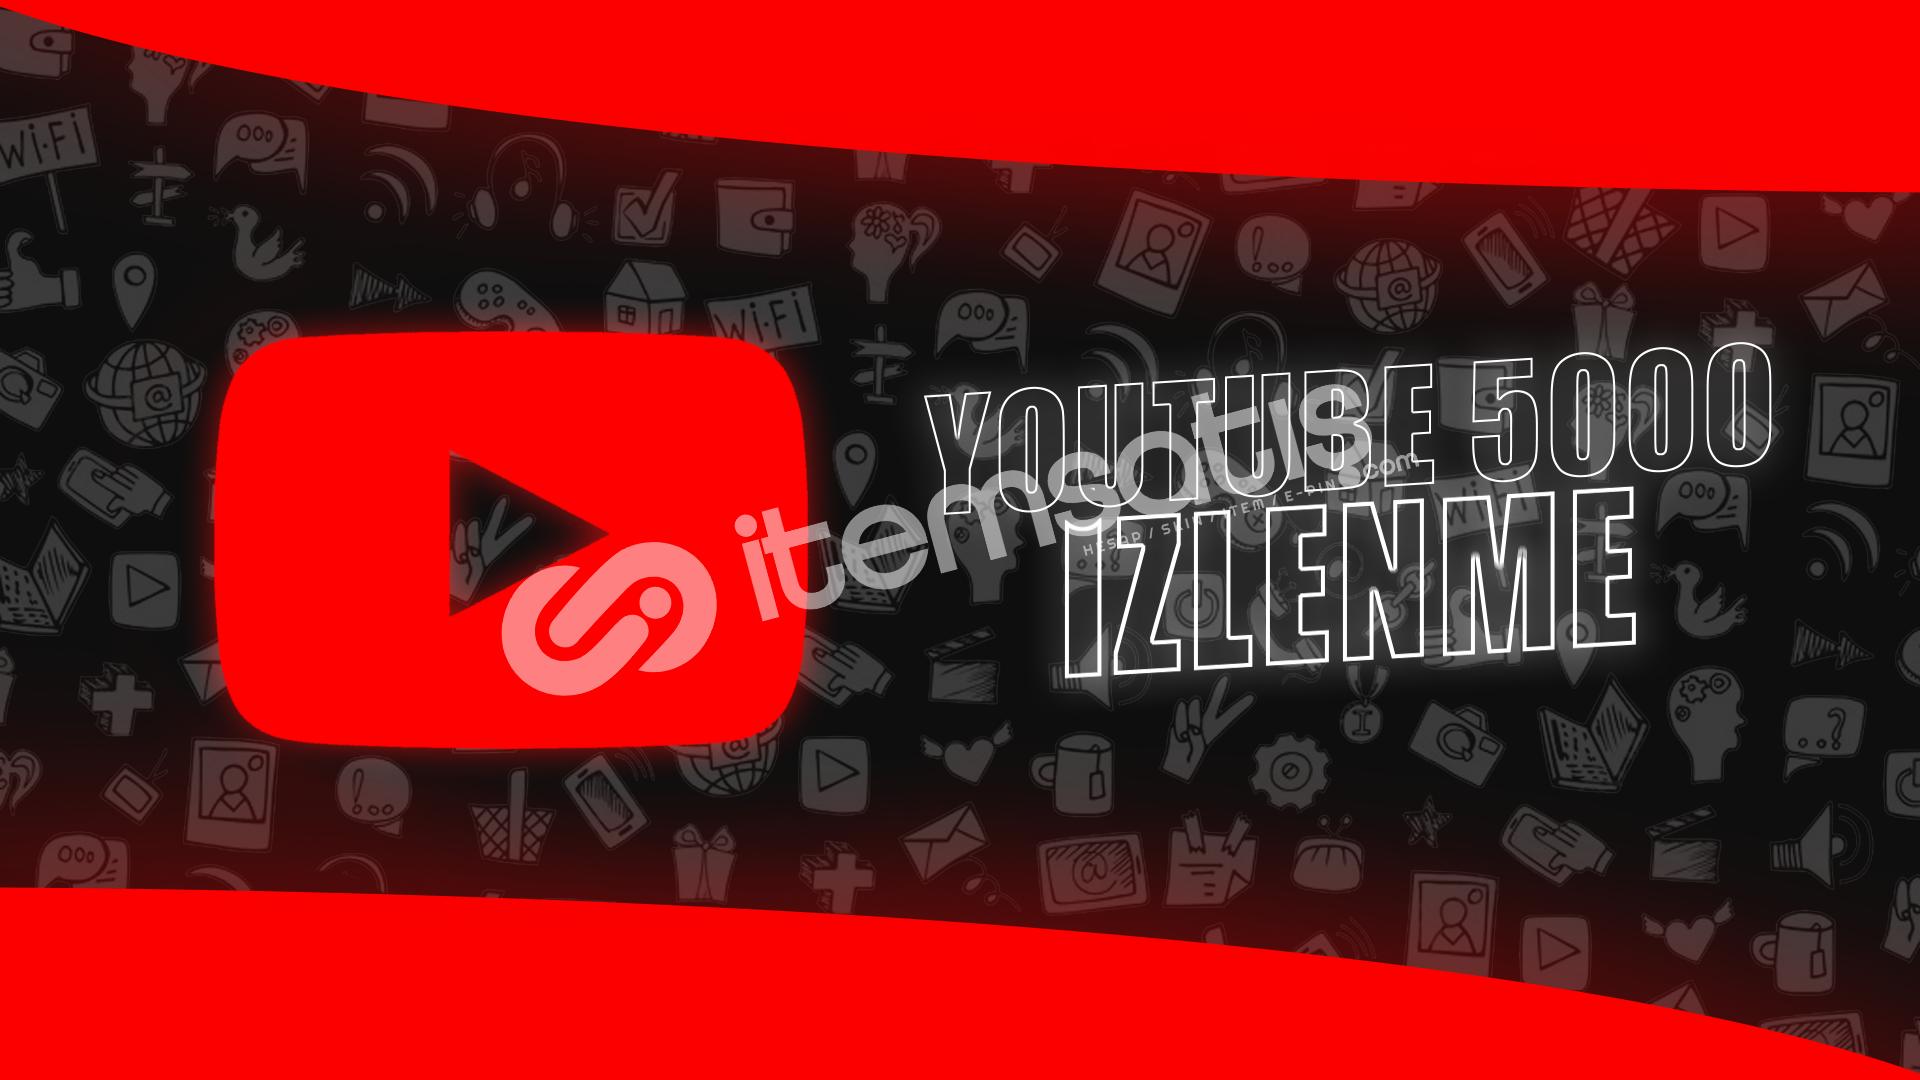 Çalışan Tek Servis! YouTube 5000 İzlenme - 30TL